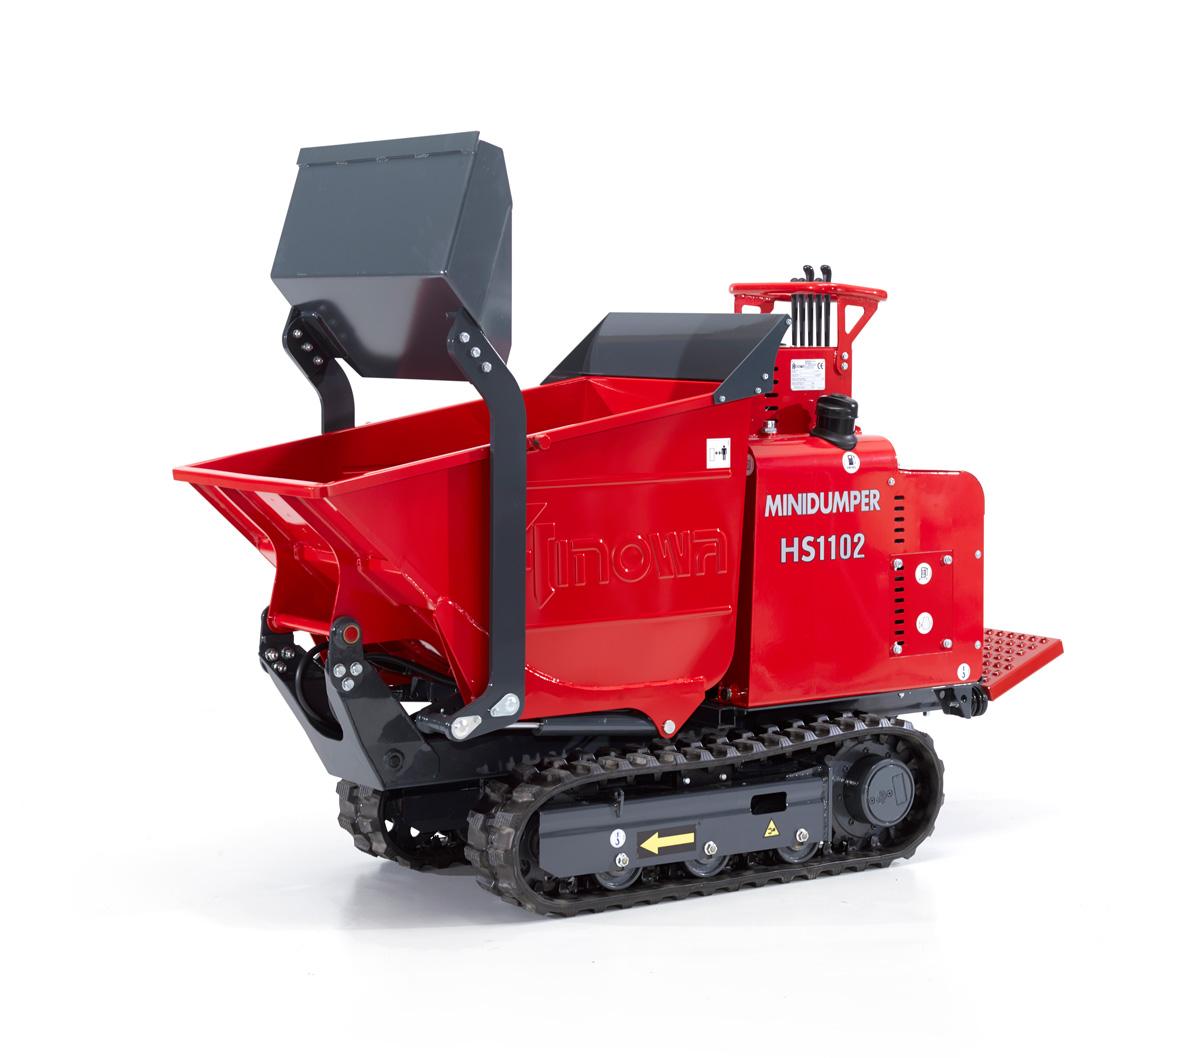 Mini Dumper HS 1102